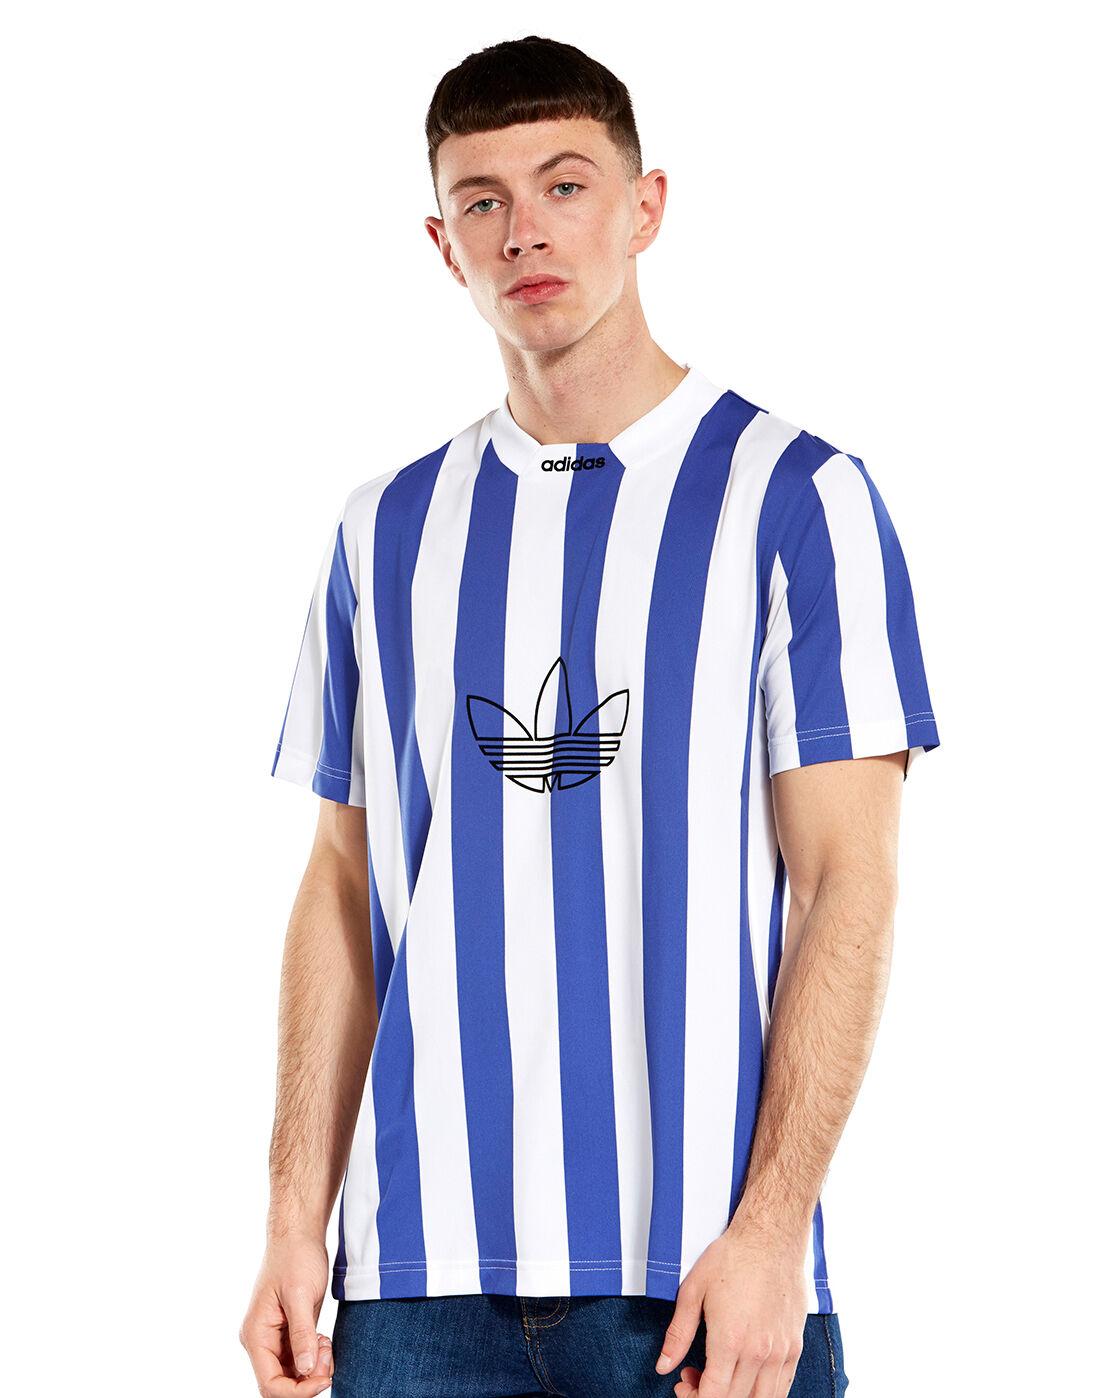 Men's Blue & White Stripe adidas Originals Jersey | Life Style Sports